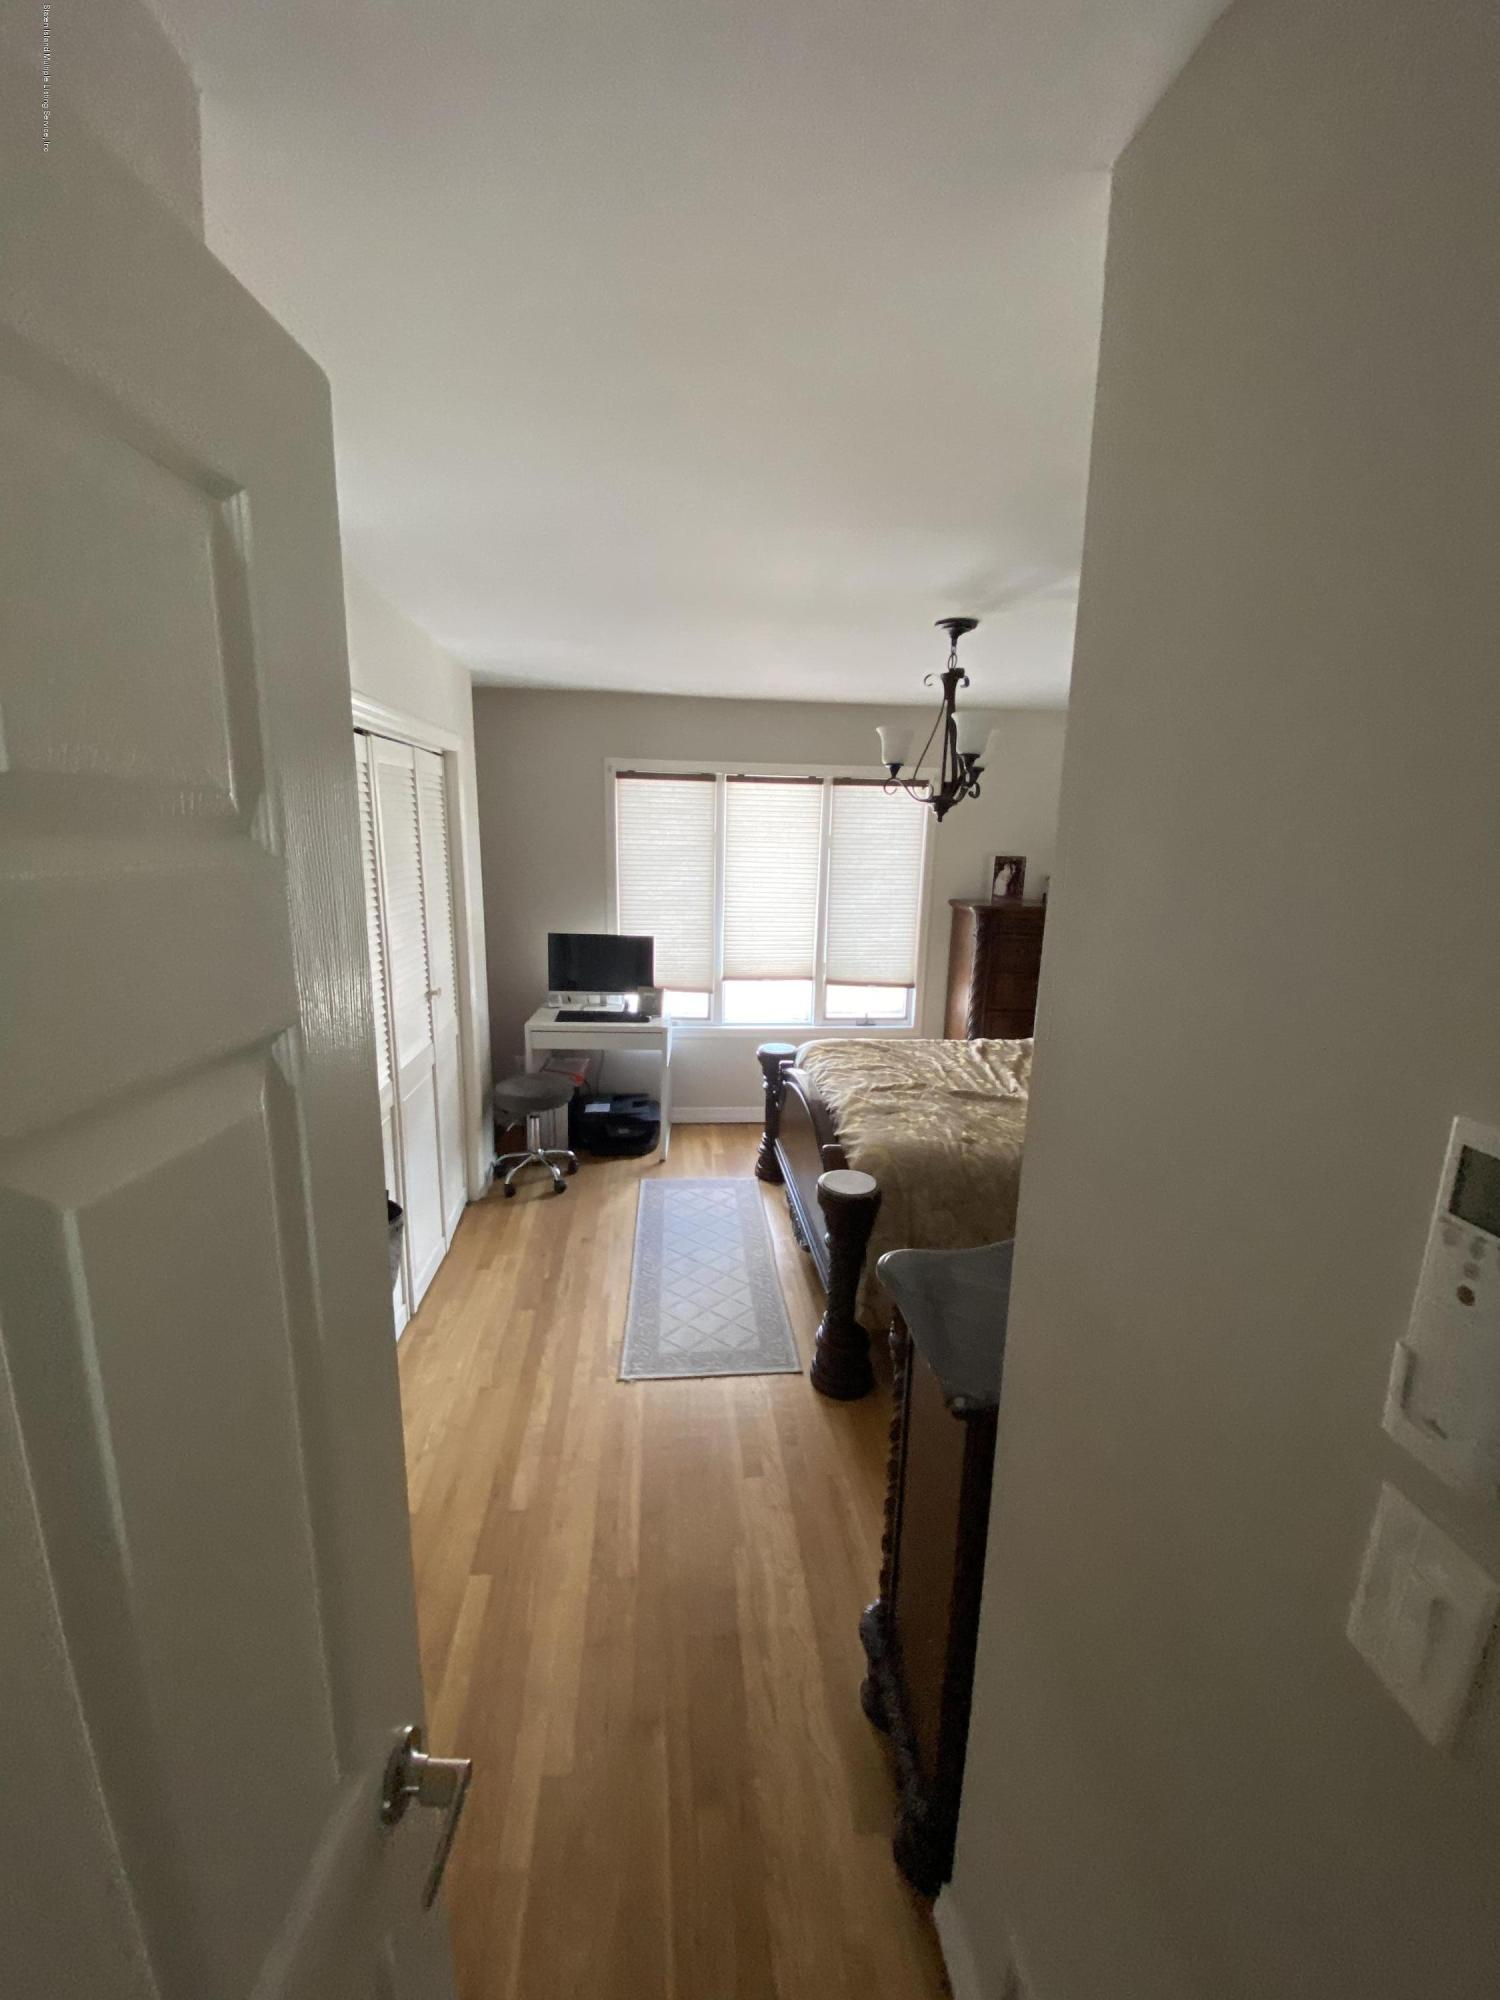 Single Family - Semi-Attached 370 Seaver Avenue  Staten Island, NY 10305, MLS-1136339-16